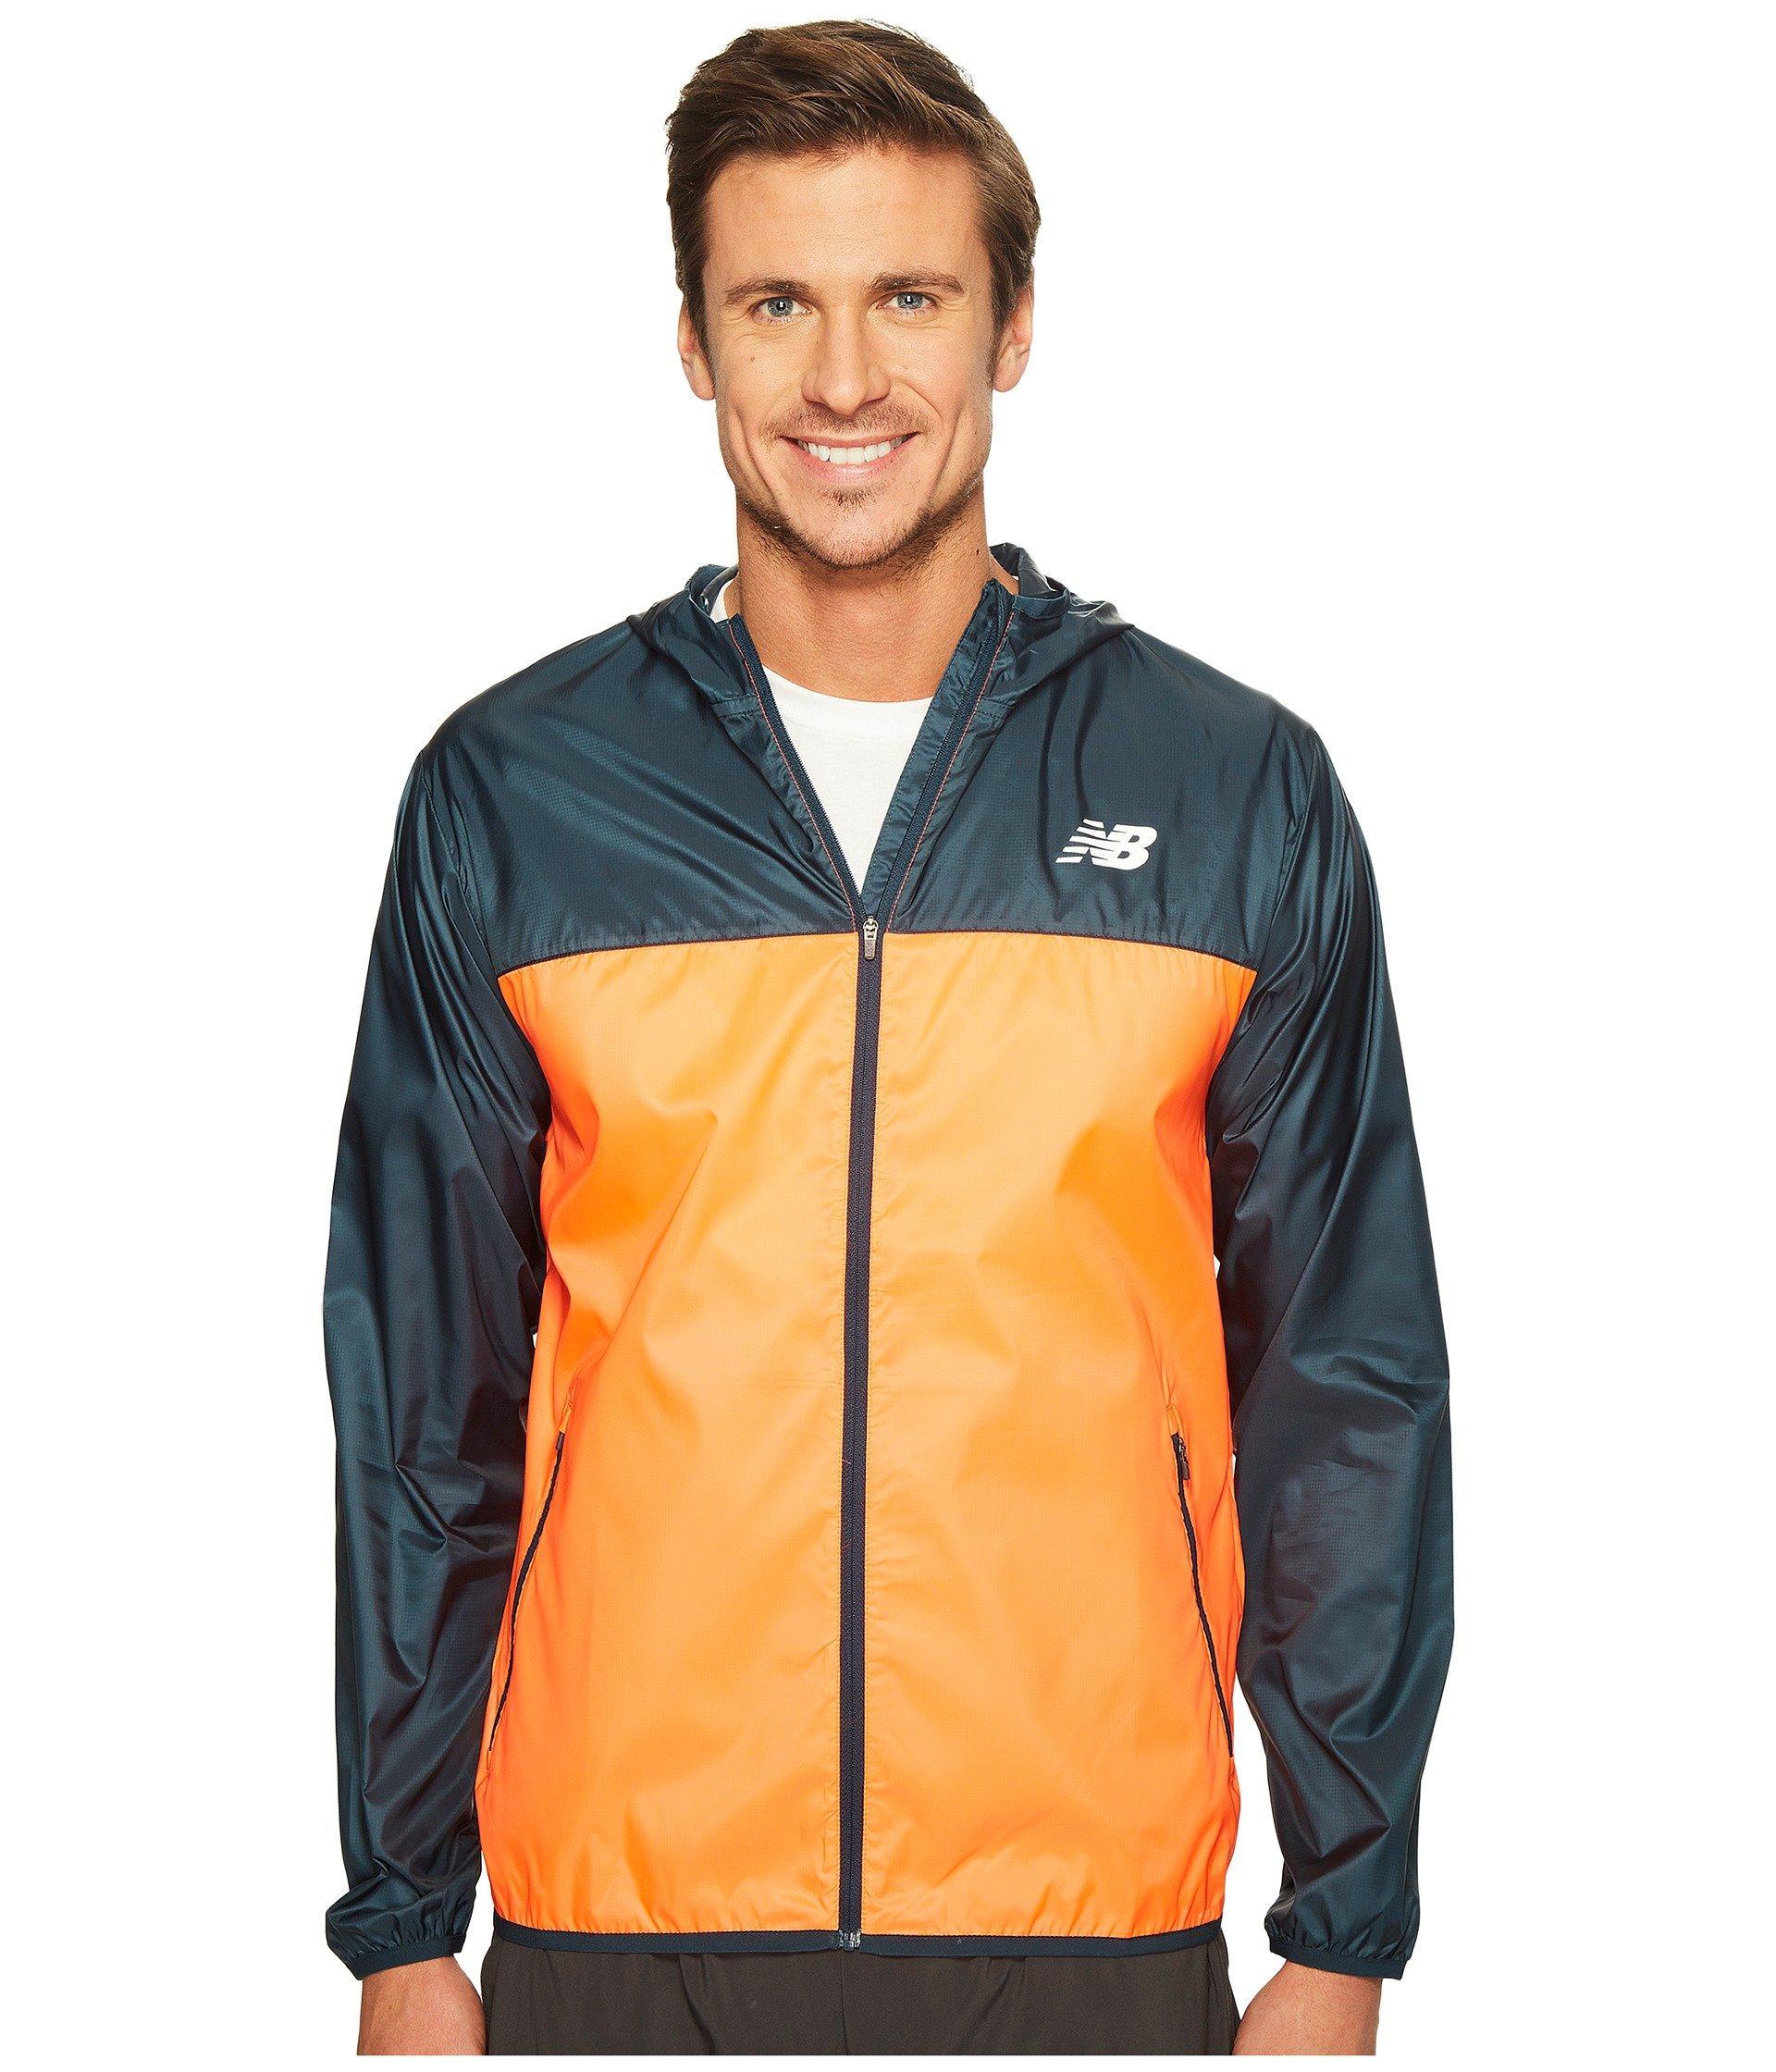 Windcheater Jacket In Alpha Orange/supercell